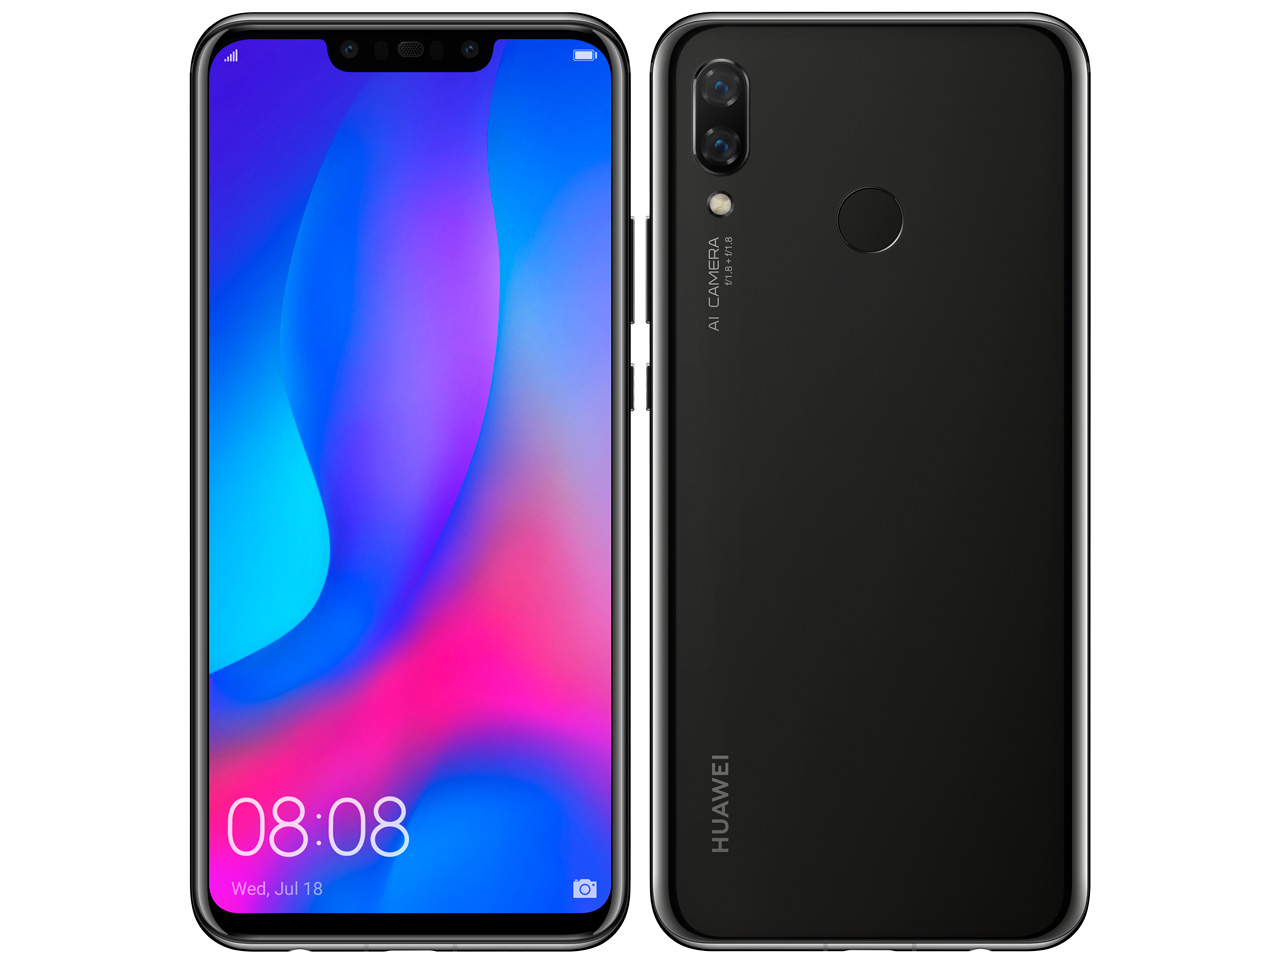 HUAWEI nova 3 SIMフリー [ブラック] の製品画像